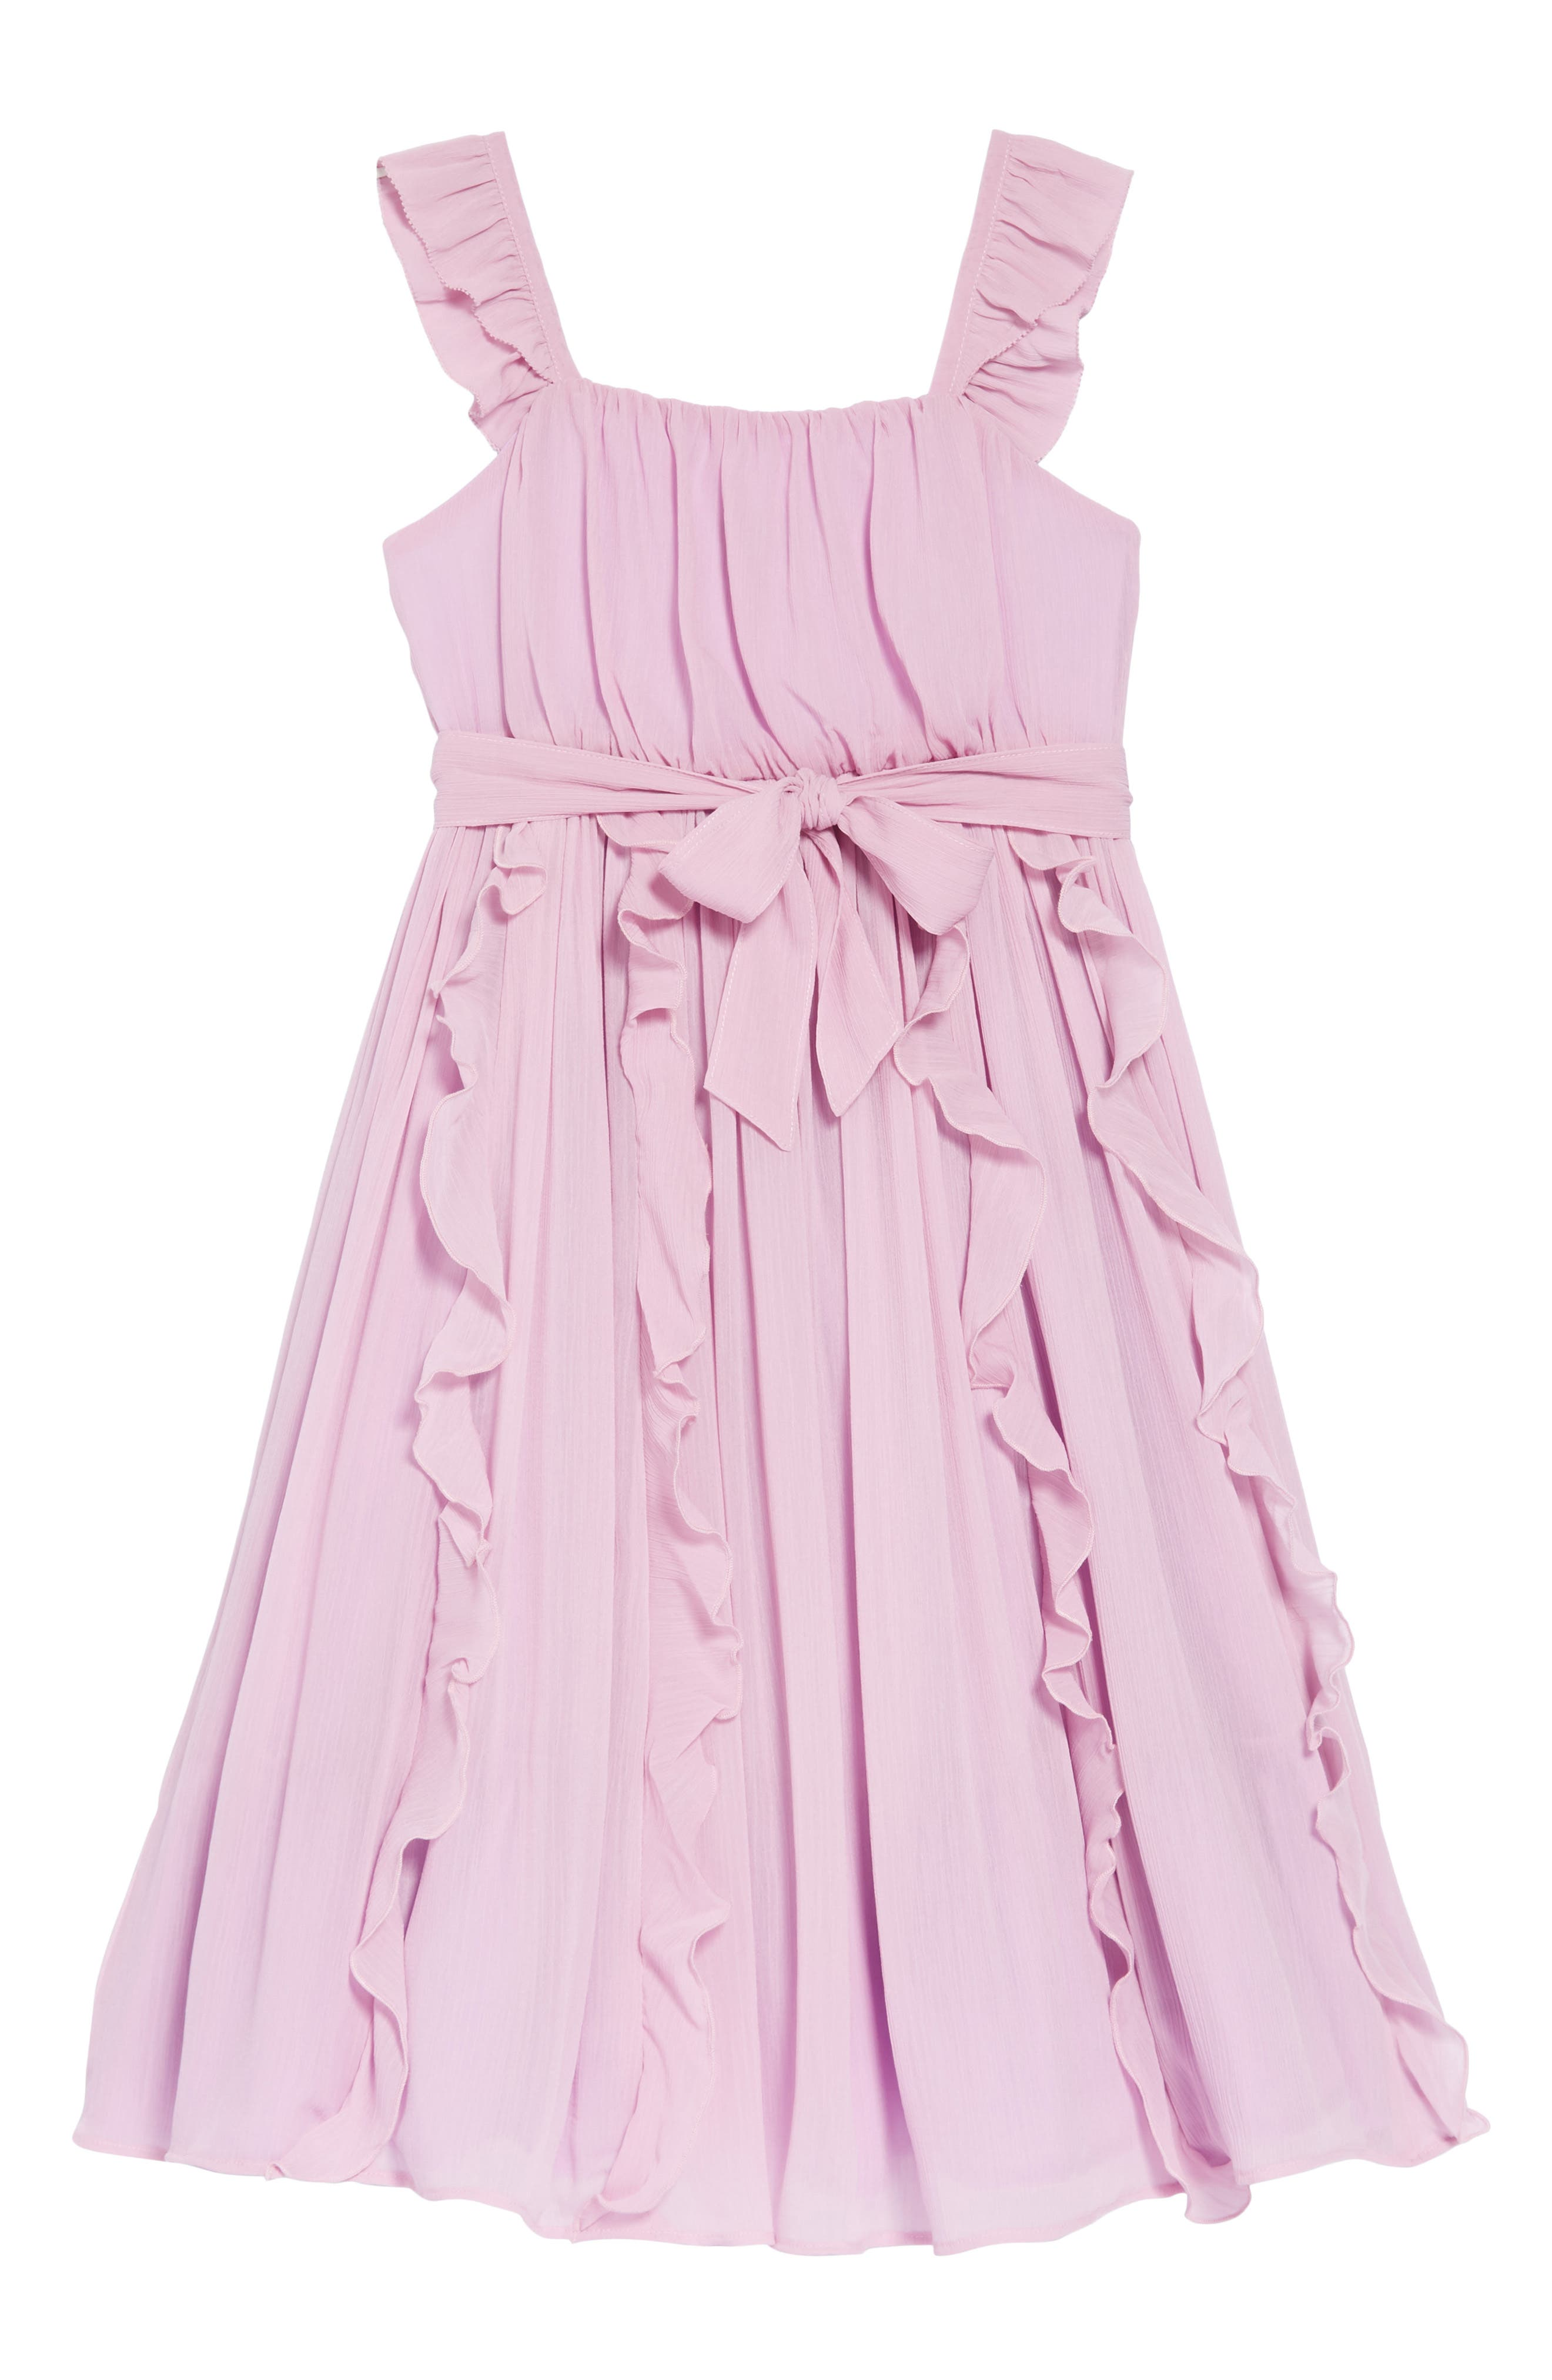 Ruffle Trim Chiffon Dress,                             Main thumbnail 1, color,                             SMOKY WISTERIA